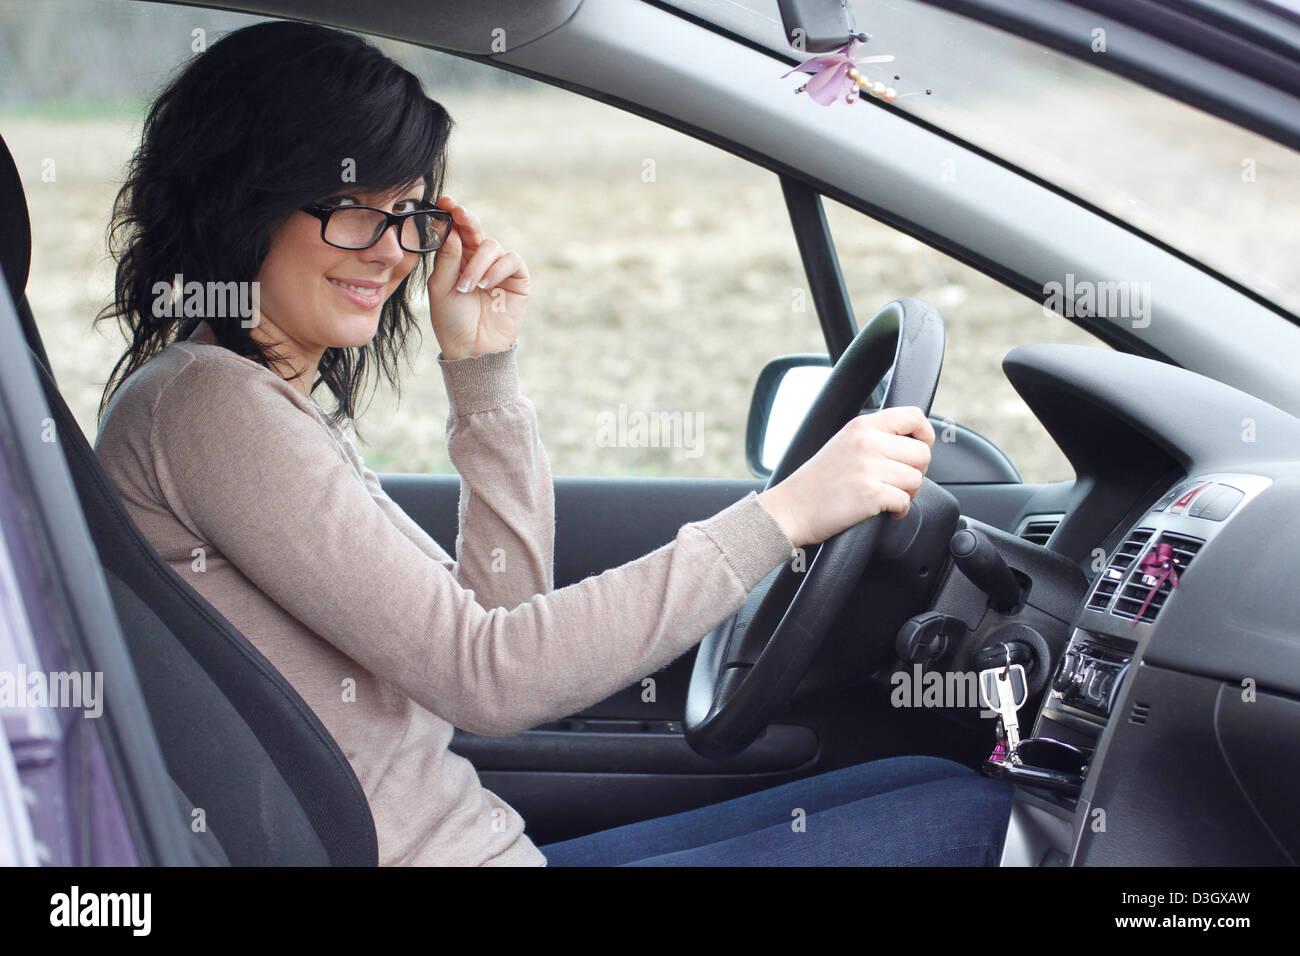 Conductor de automóvil Imagen De Stock